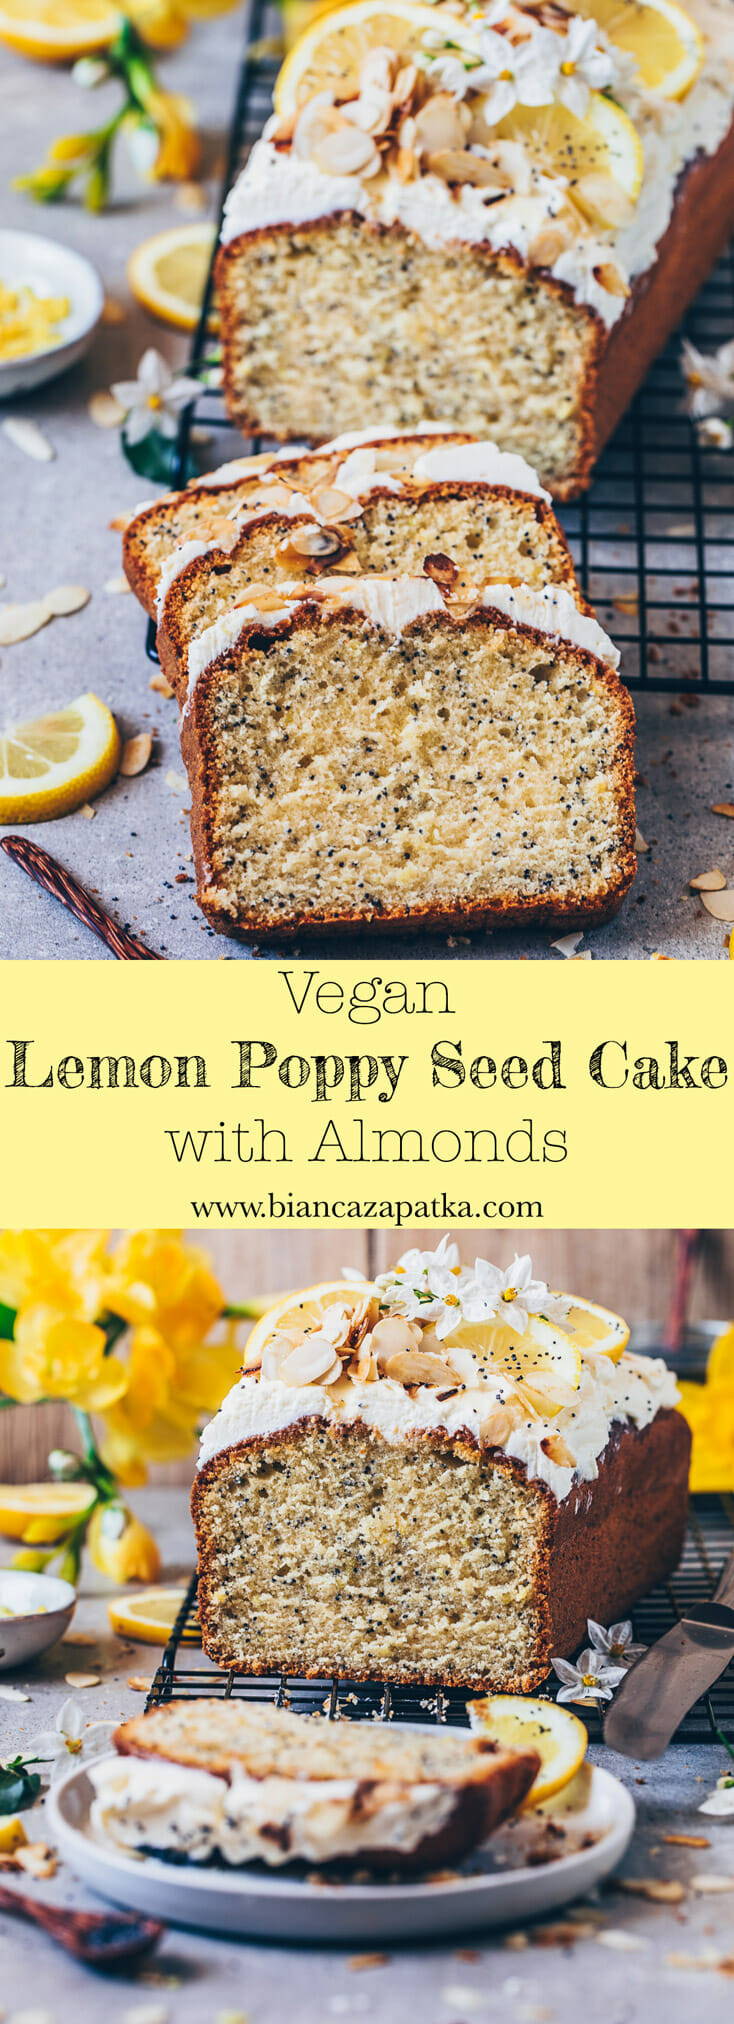 Vegan Lemon Cake Recipes  Lemon Poppy Seed Cake Vegan Bianca Zapatka